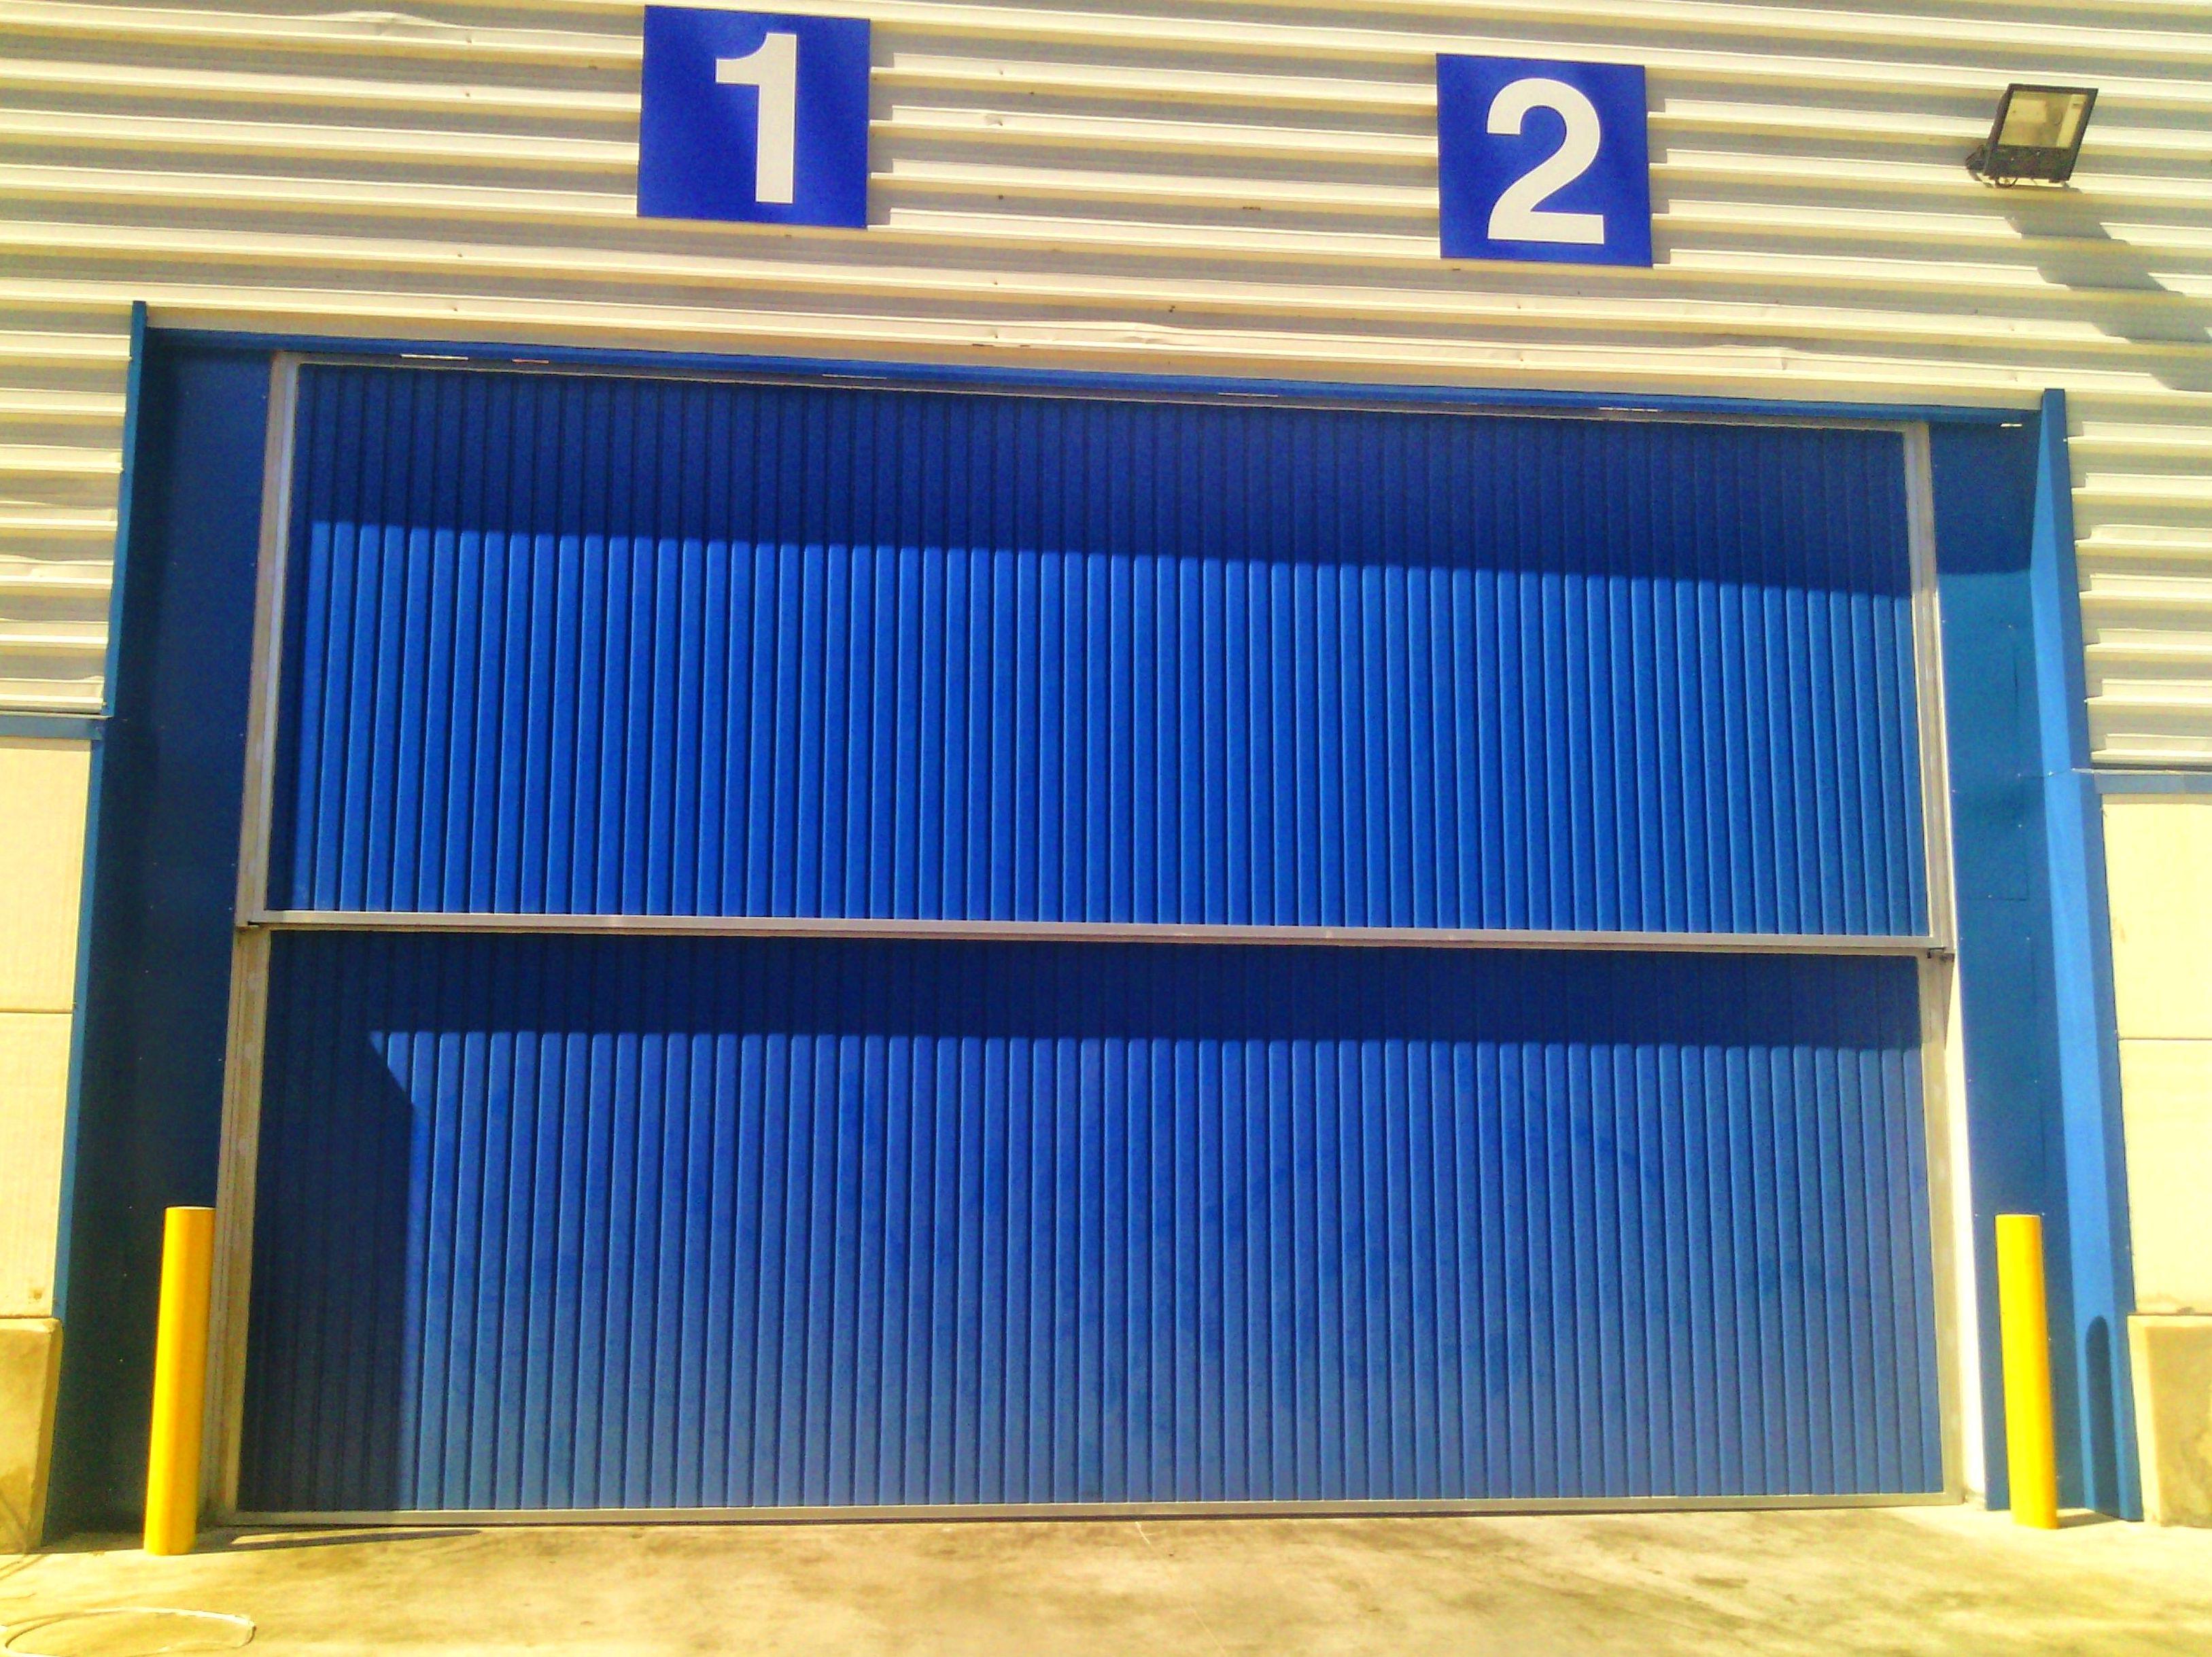 Puerta industrial guillotina de chapa grecada vertical de 2 hojas